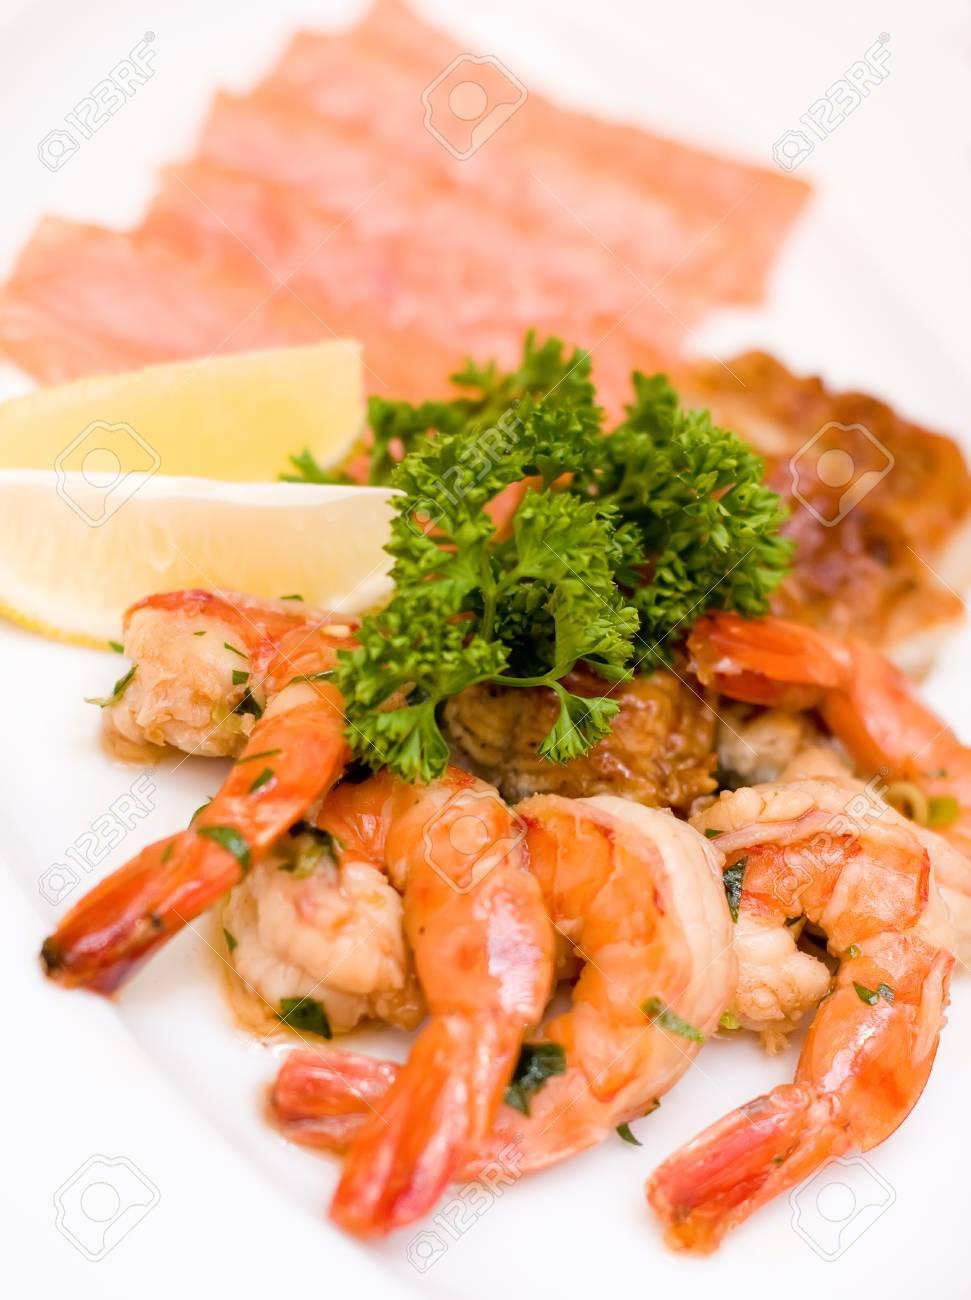 Fish Platter Marinated Shrimp Smoked Eel Chum Salmon On White Stock Photo Picture And Royalty Free Image Image 89091176